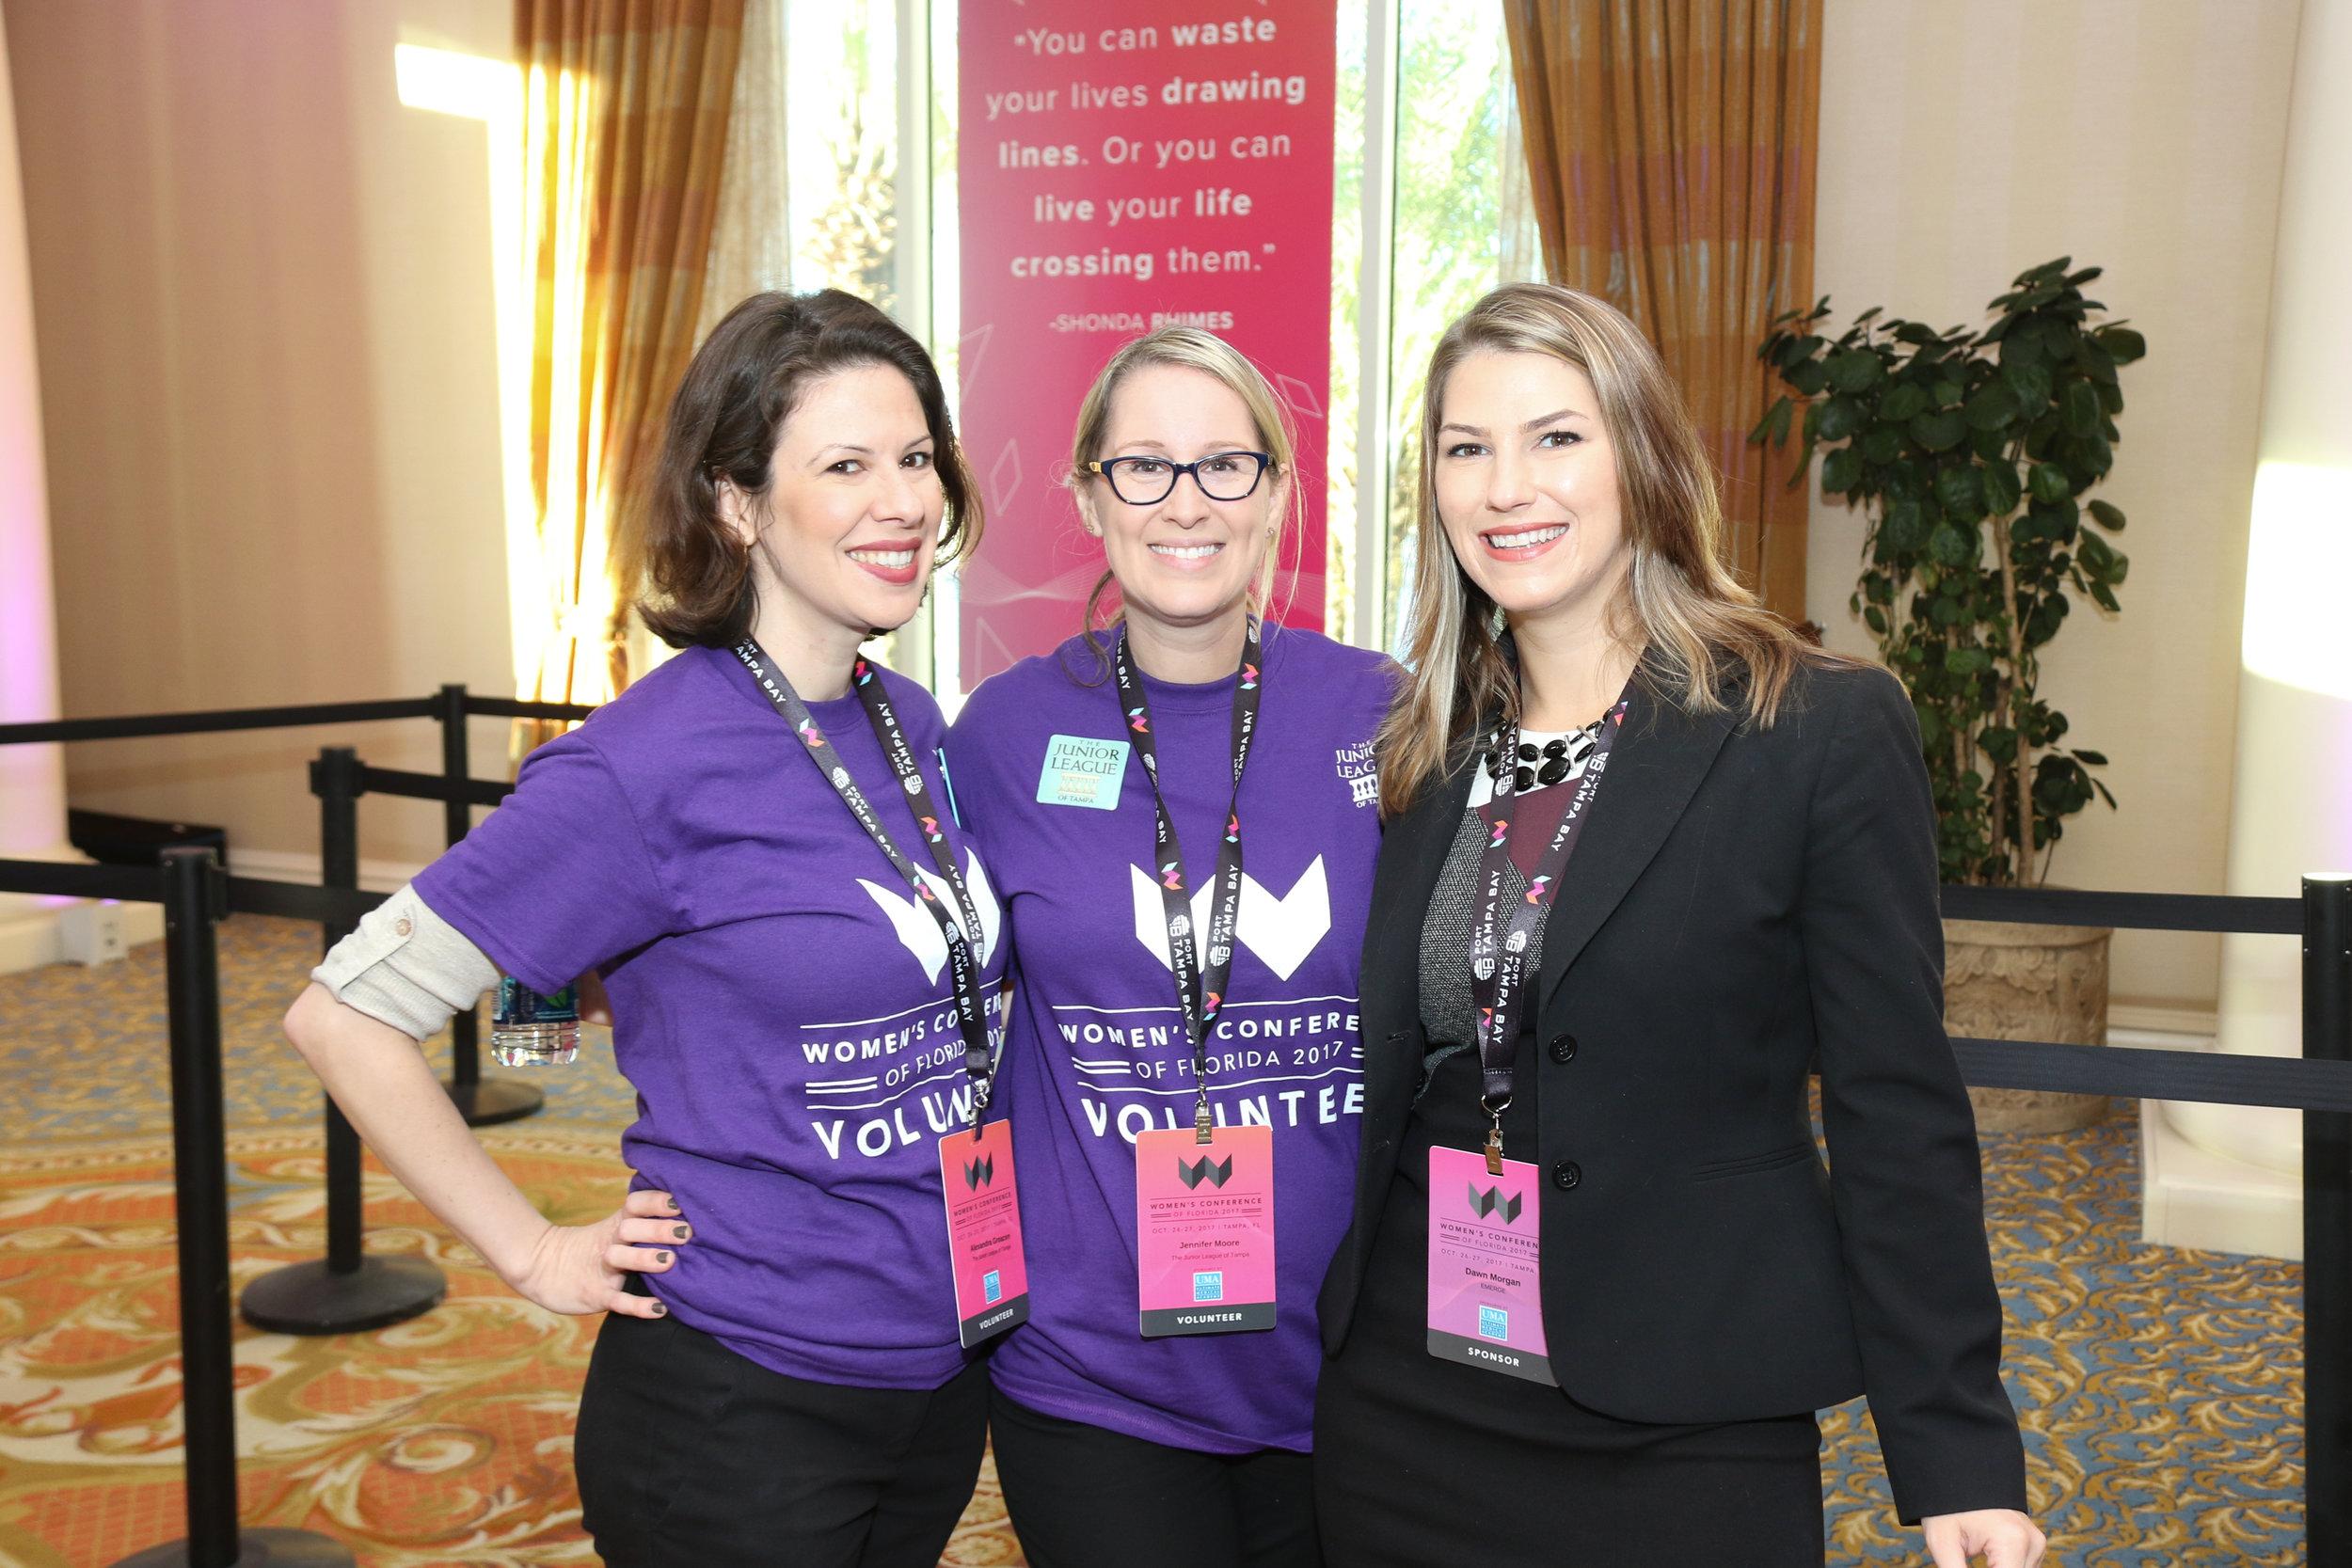 057_WomensConference_10-26-17.jpg